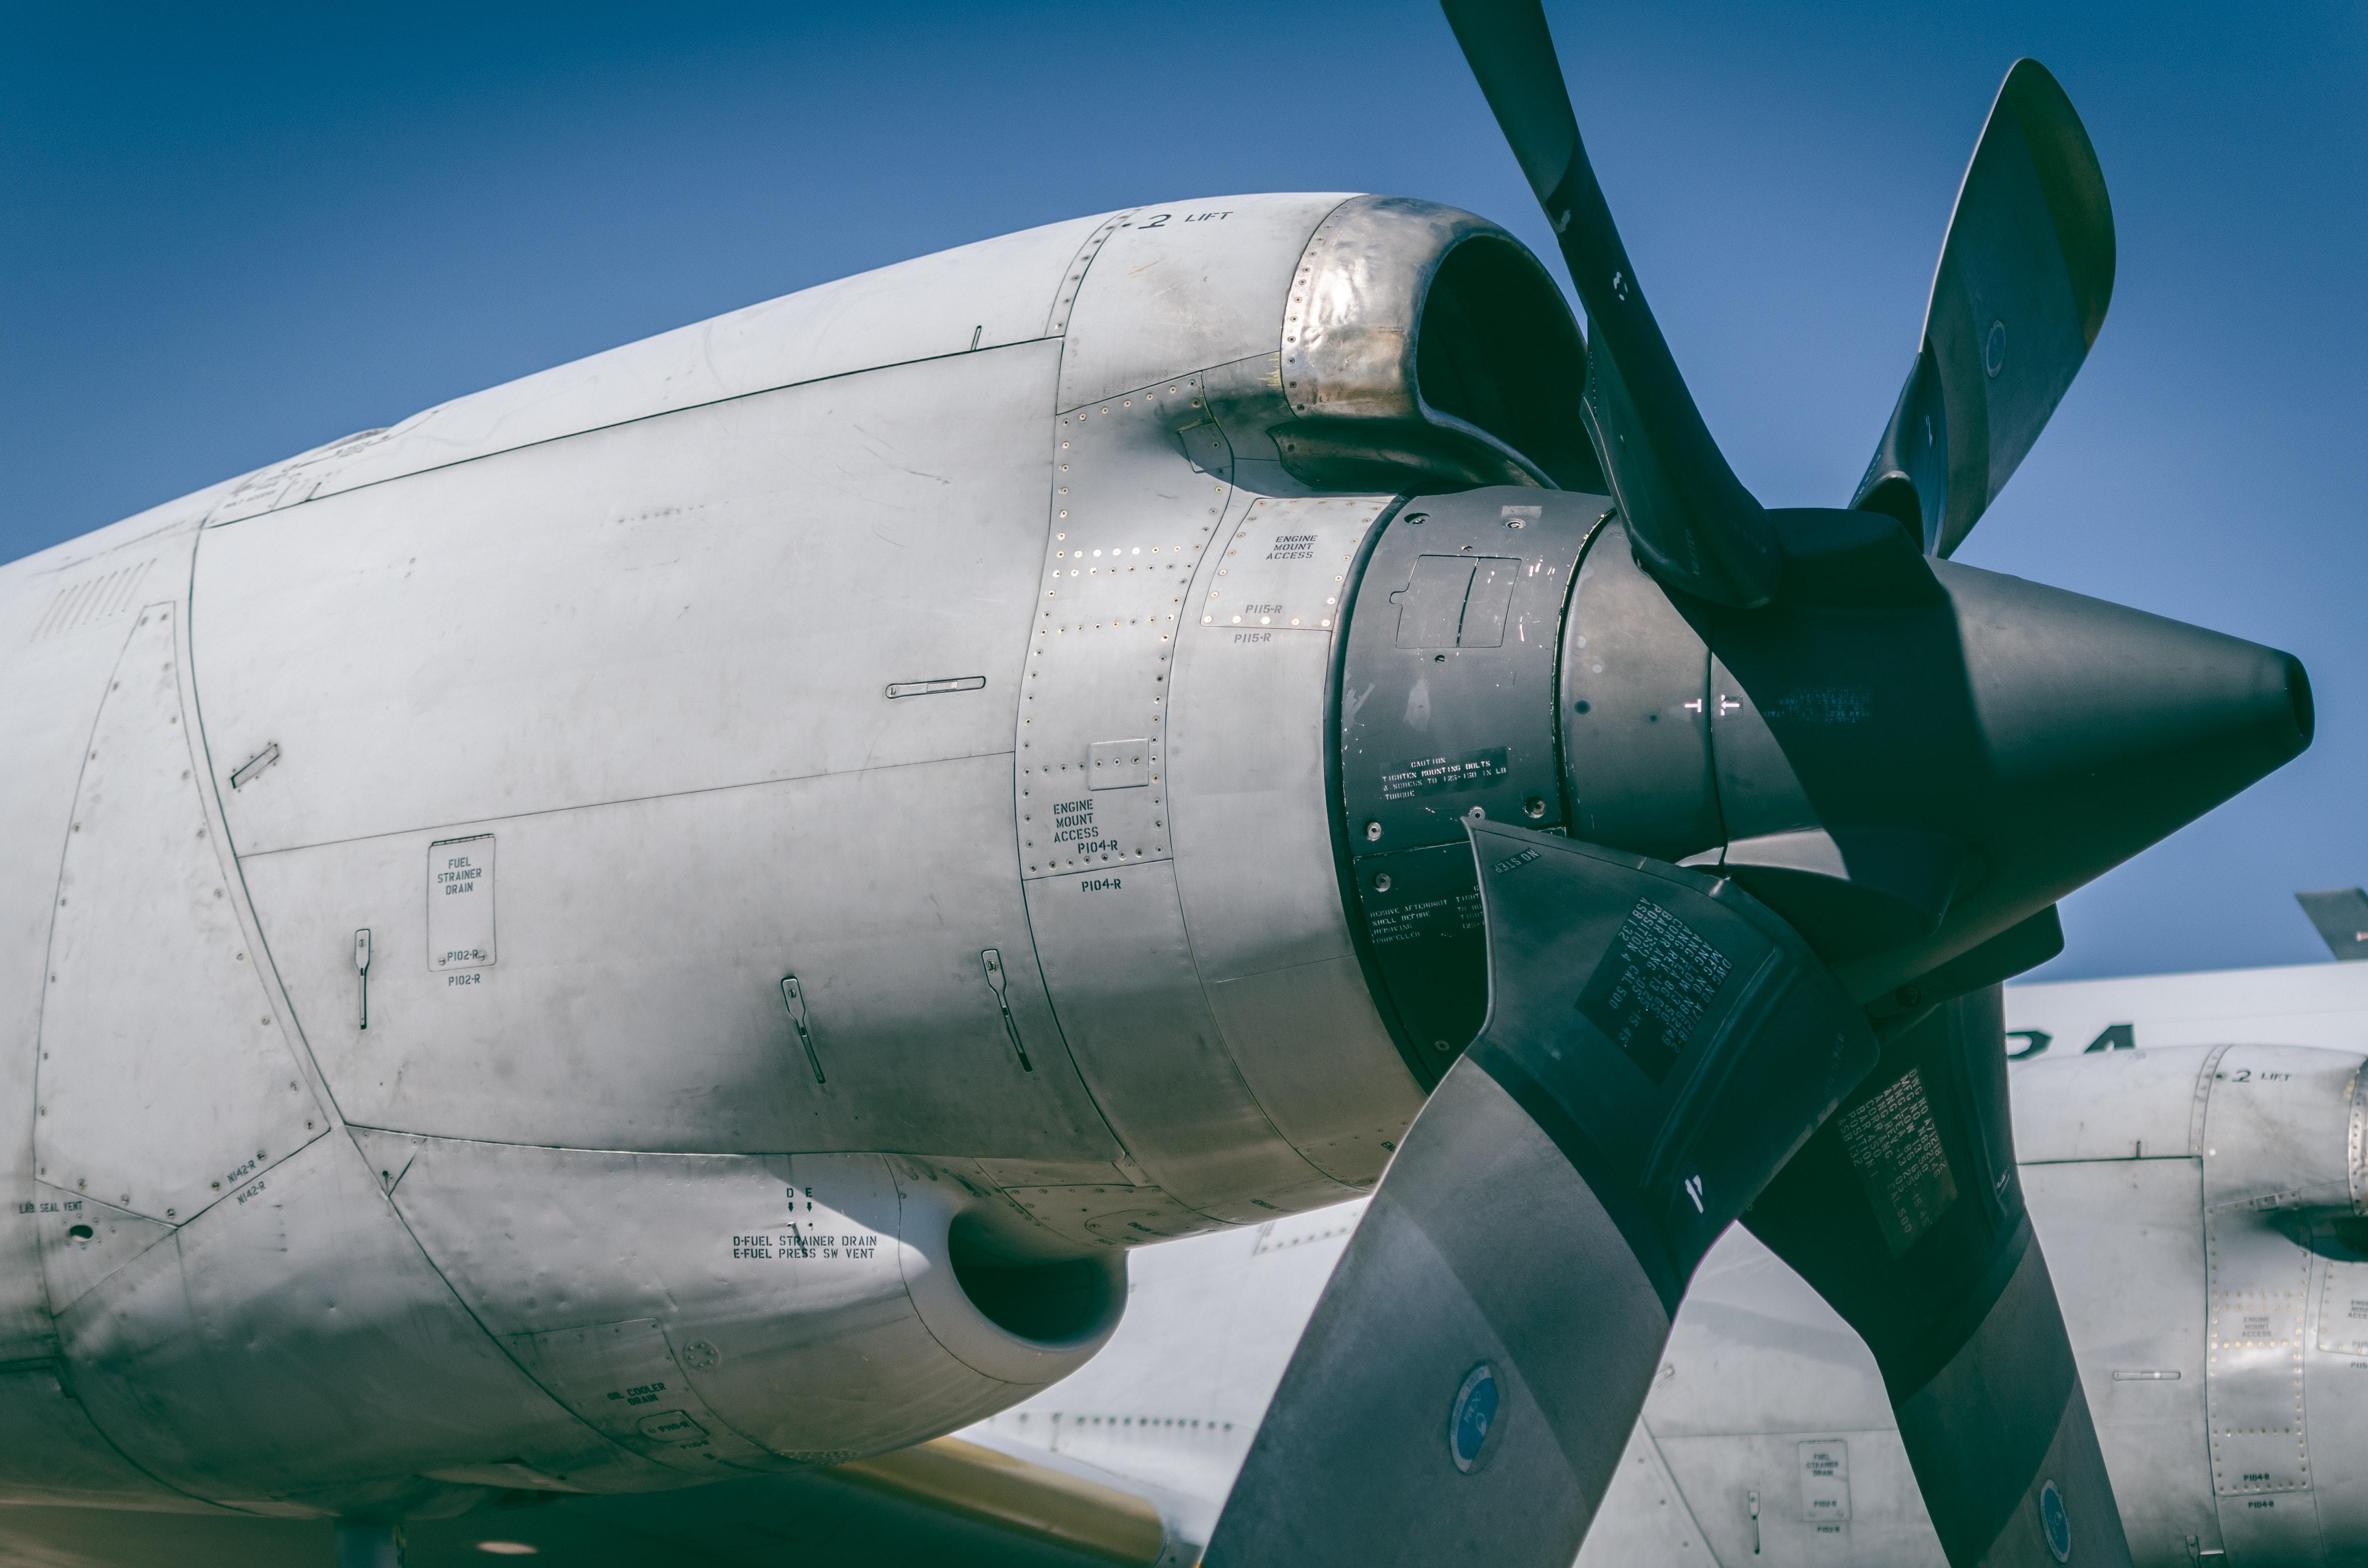 Gray and black plane photo